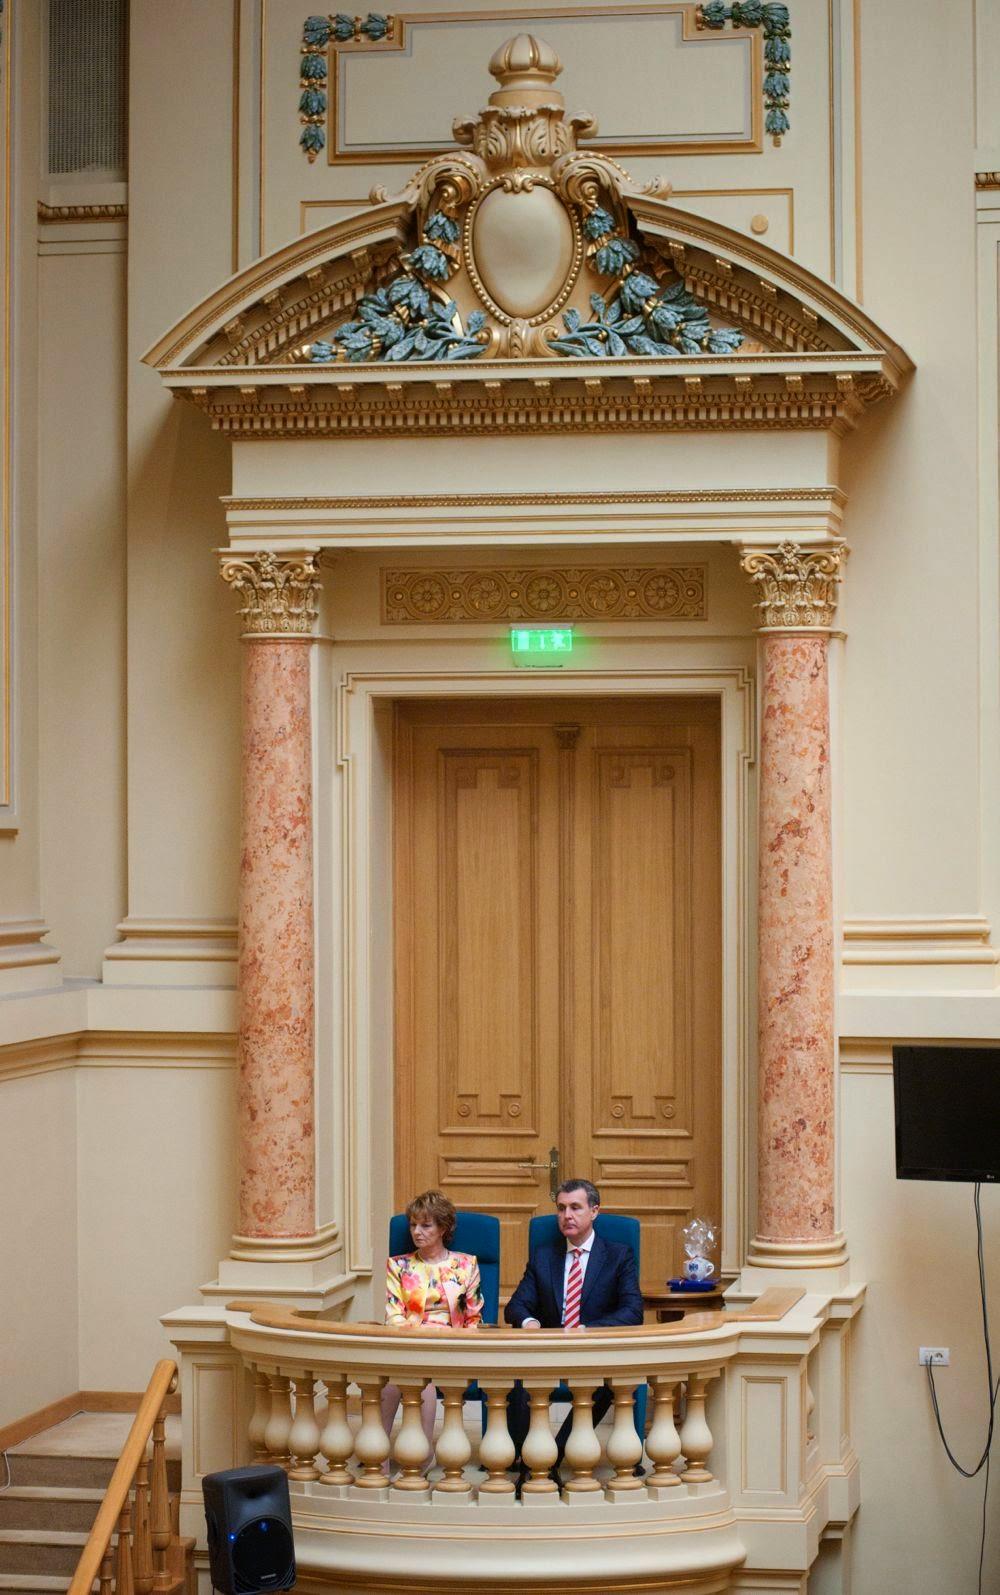 Familia Regală la Biblioteca Centrala Universitara Regele Carol I - Principesa Margareta, principele Radu